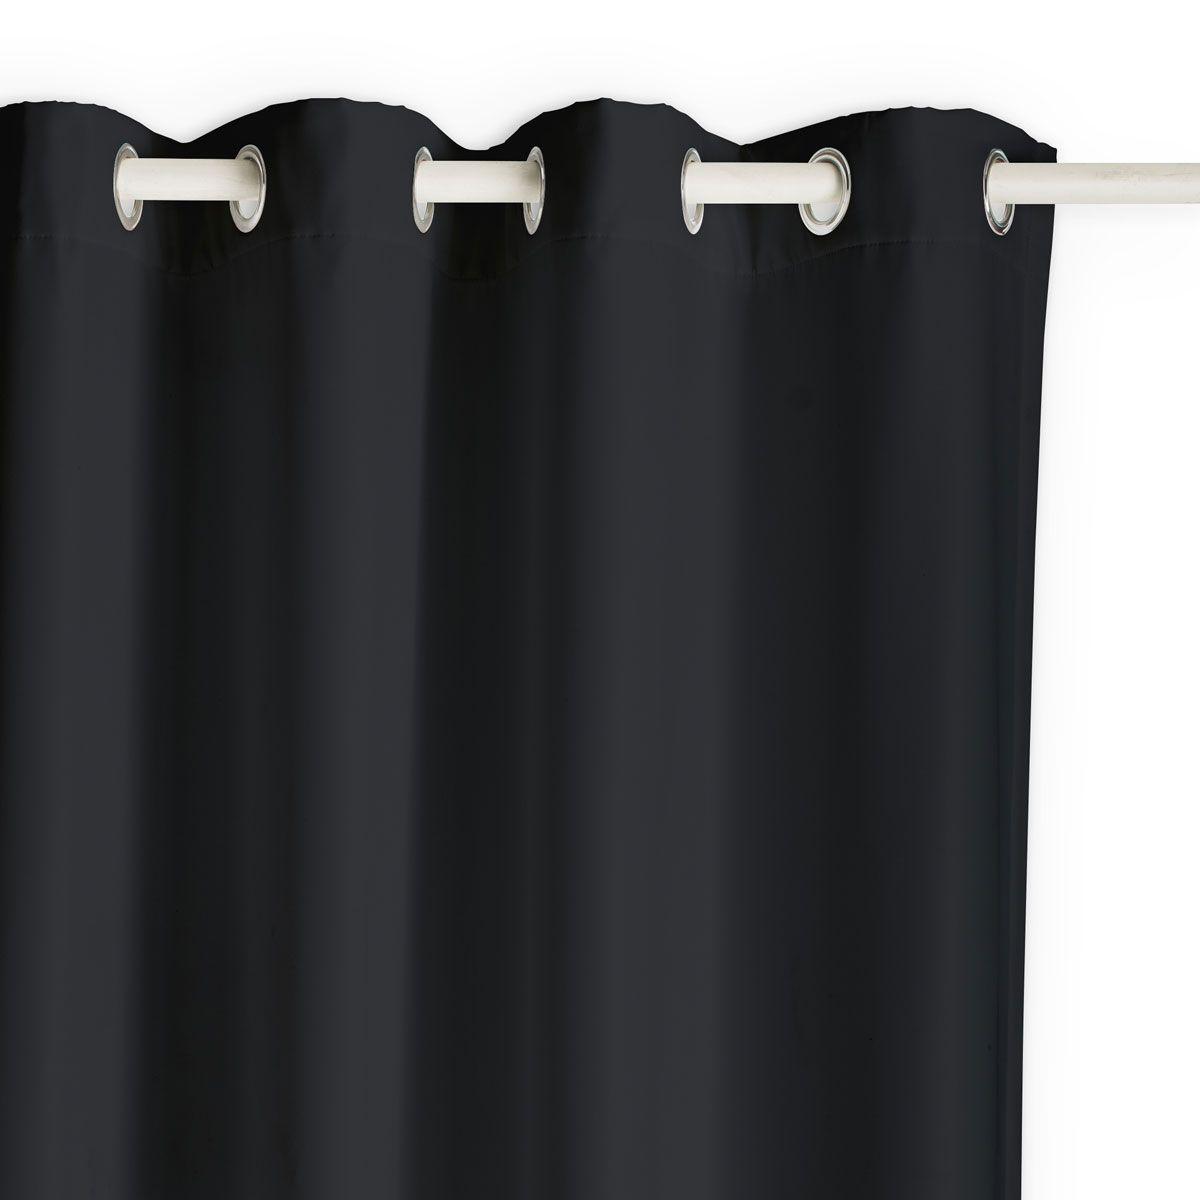 Rideau occultant Isolant buga noir 140x240cm